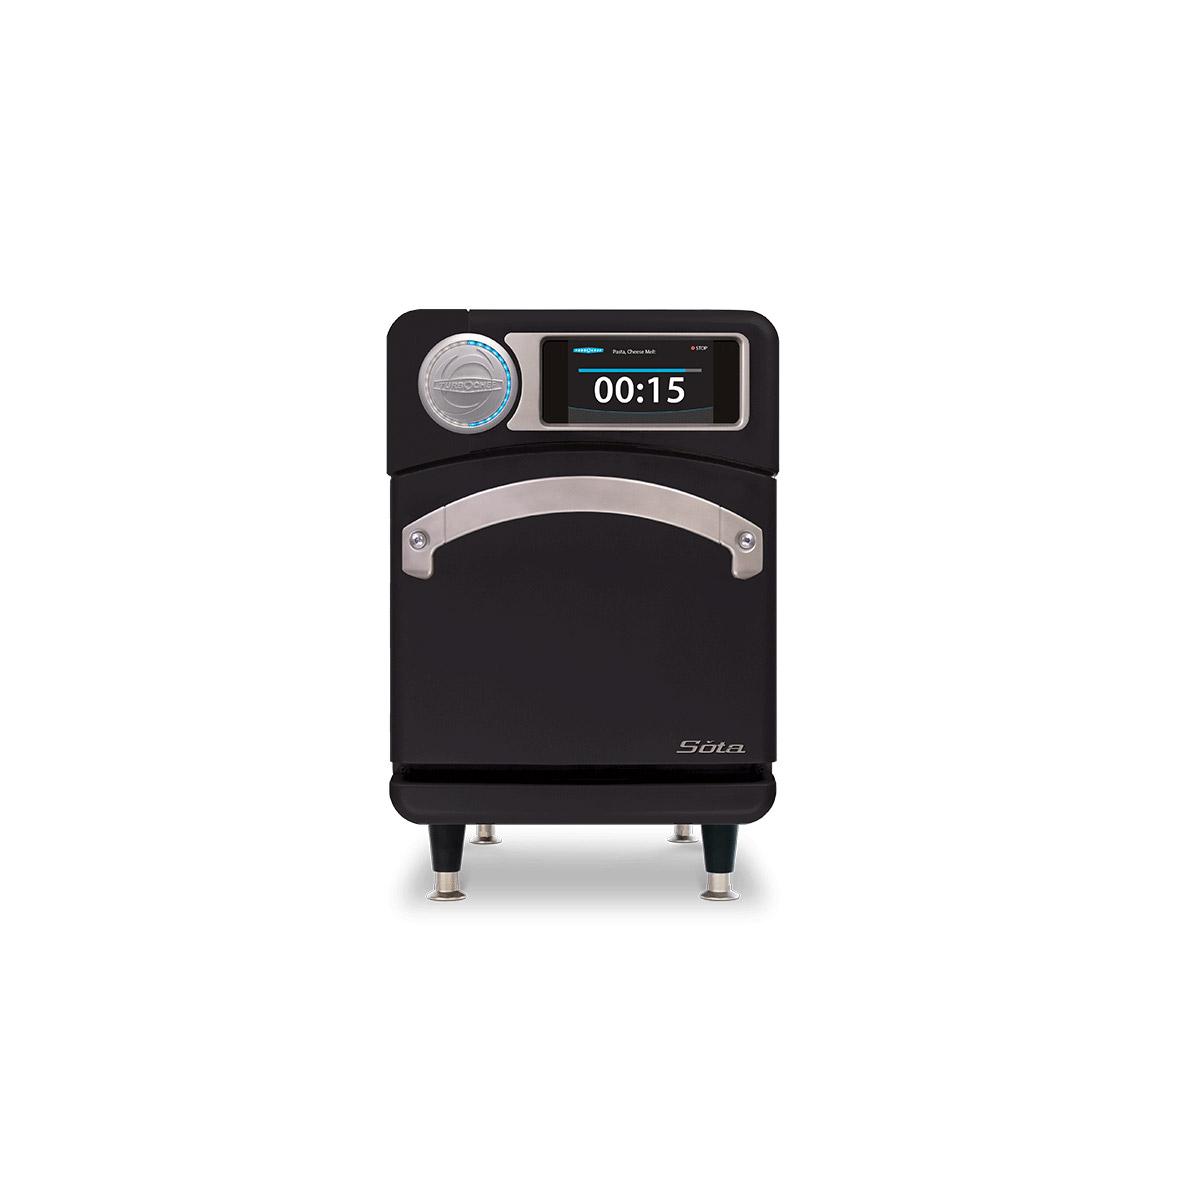 Turbochef Sota I1 High Speed Oven